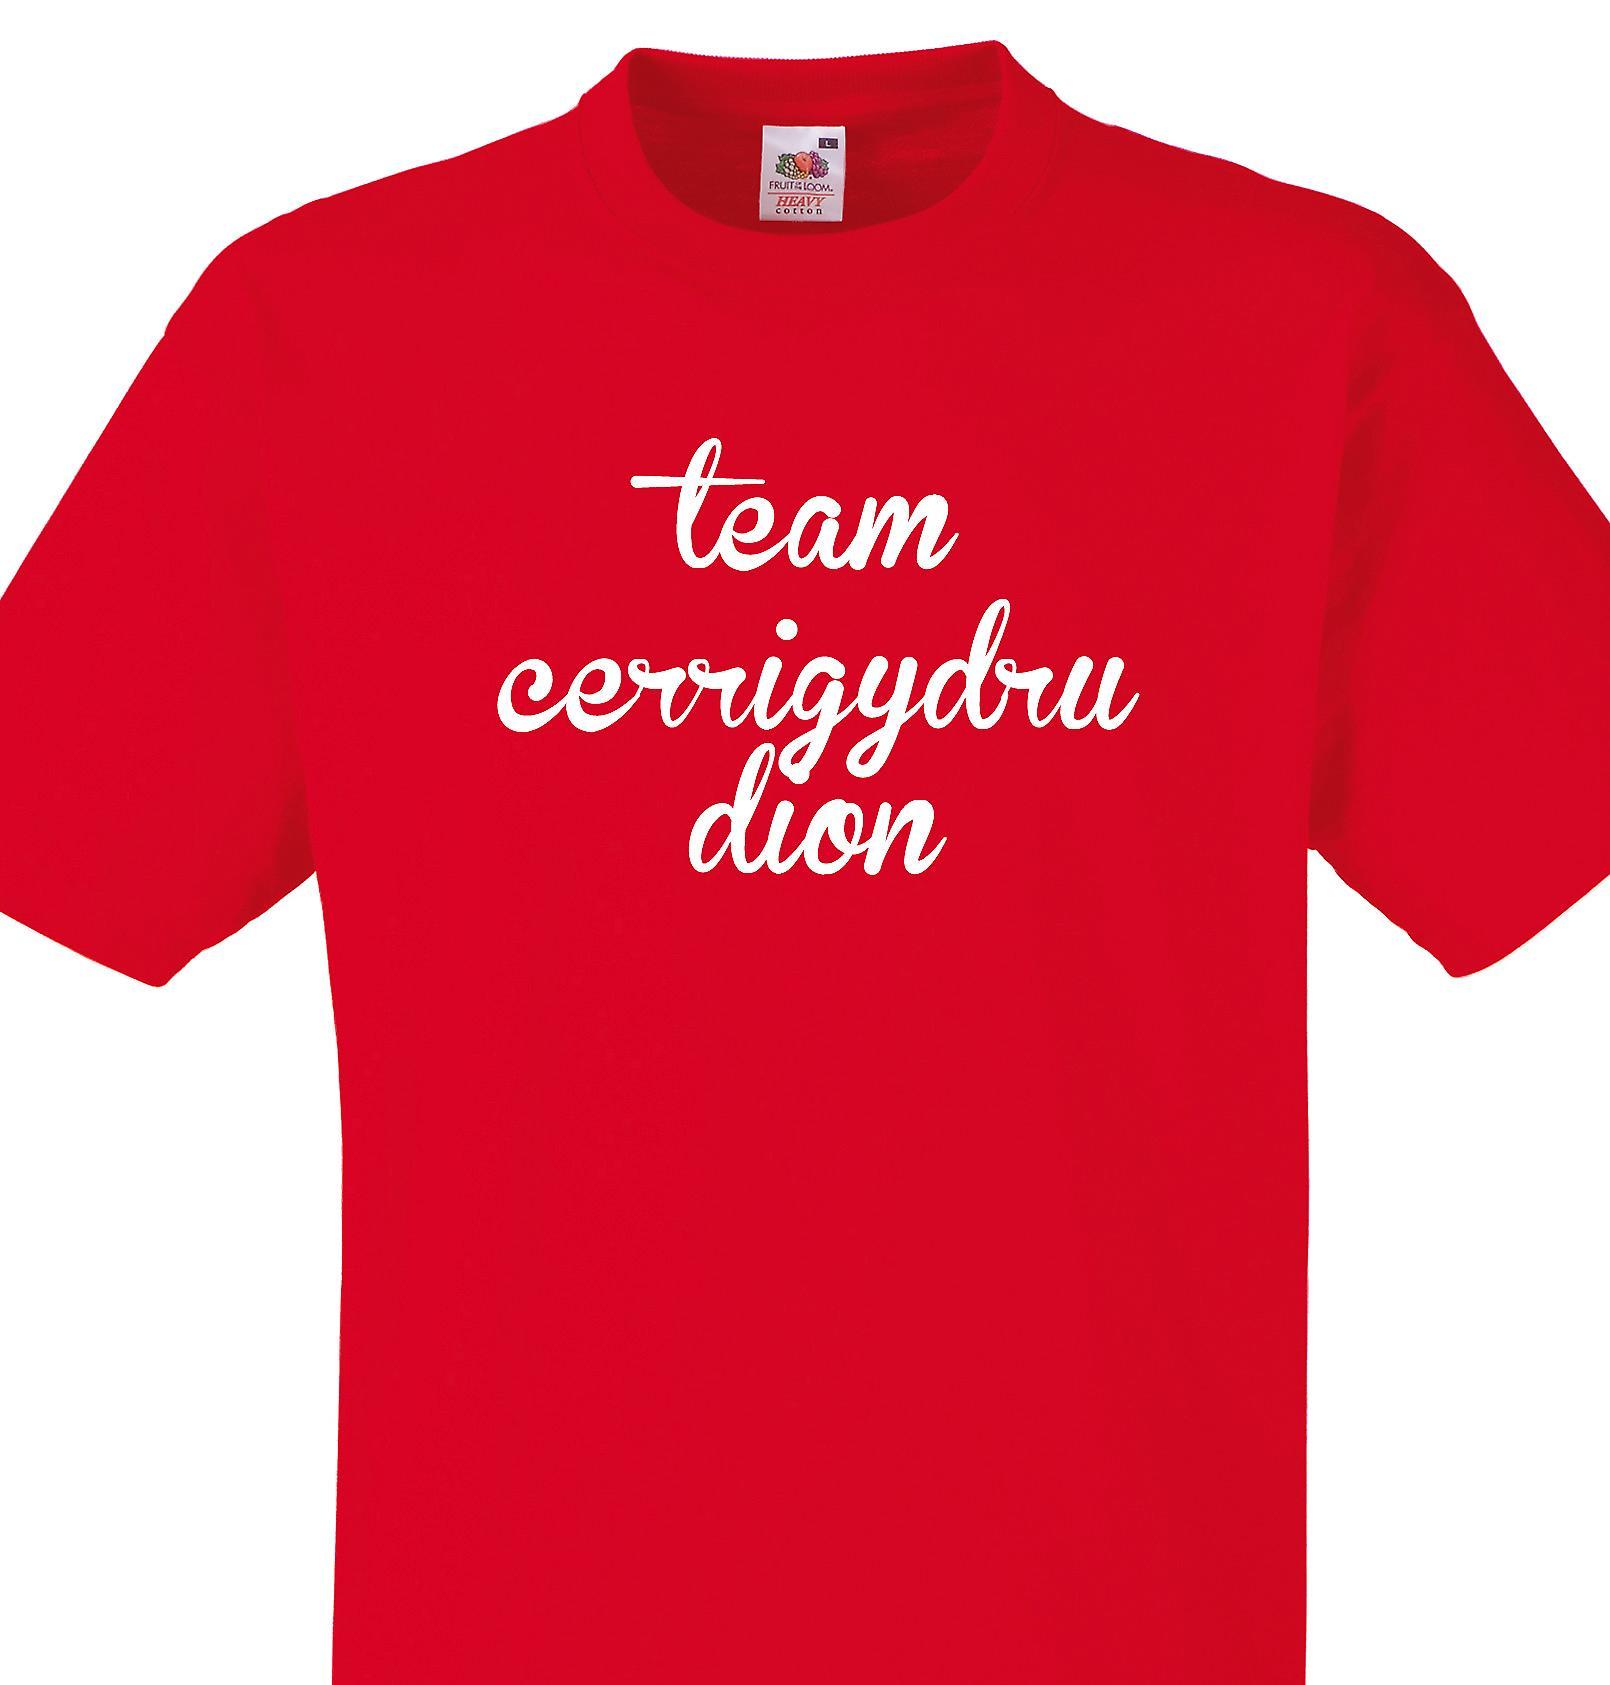 Team Cerrigydrudion Red T shirt